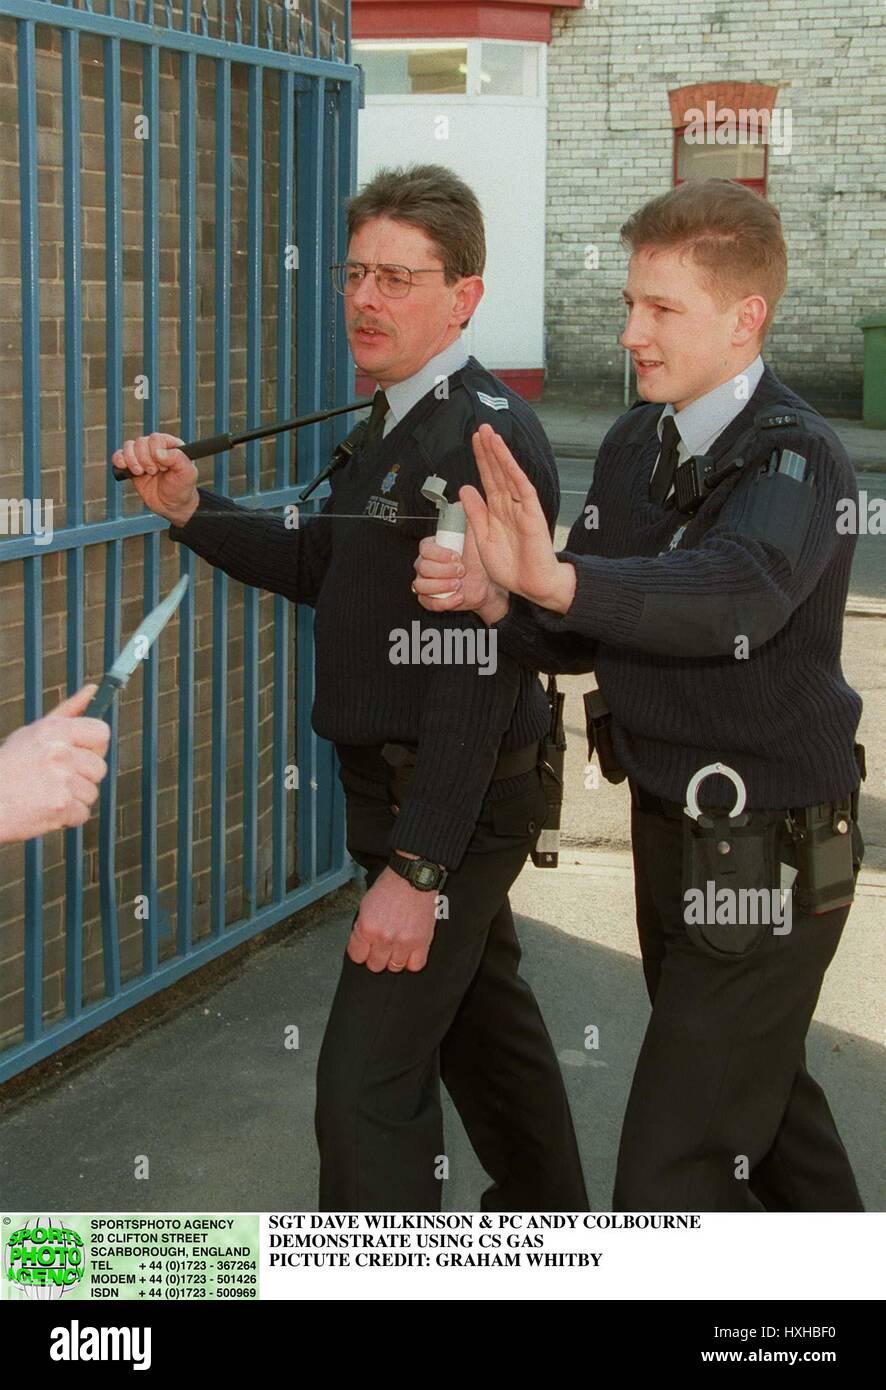 SCARBOROUGH POLICE TEST CS CS SPRAY TEST 04 April 1996 - Stock Image